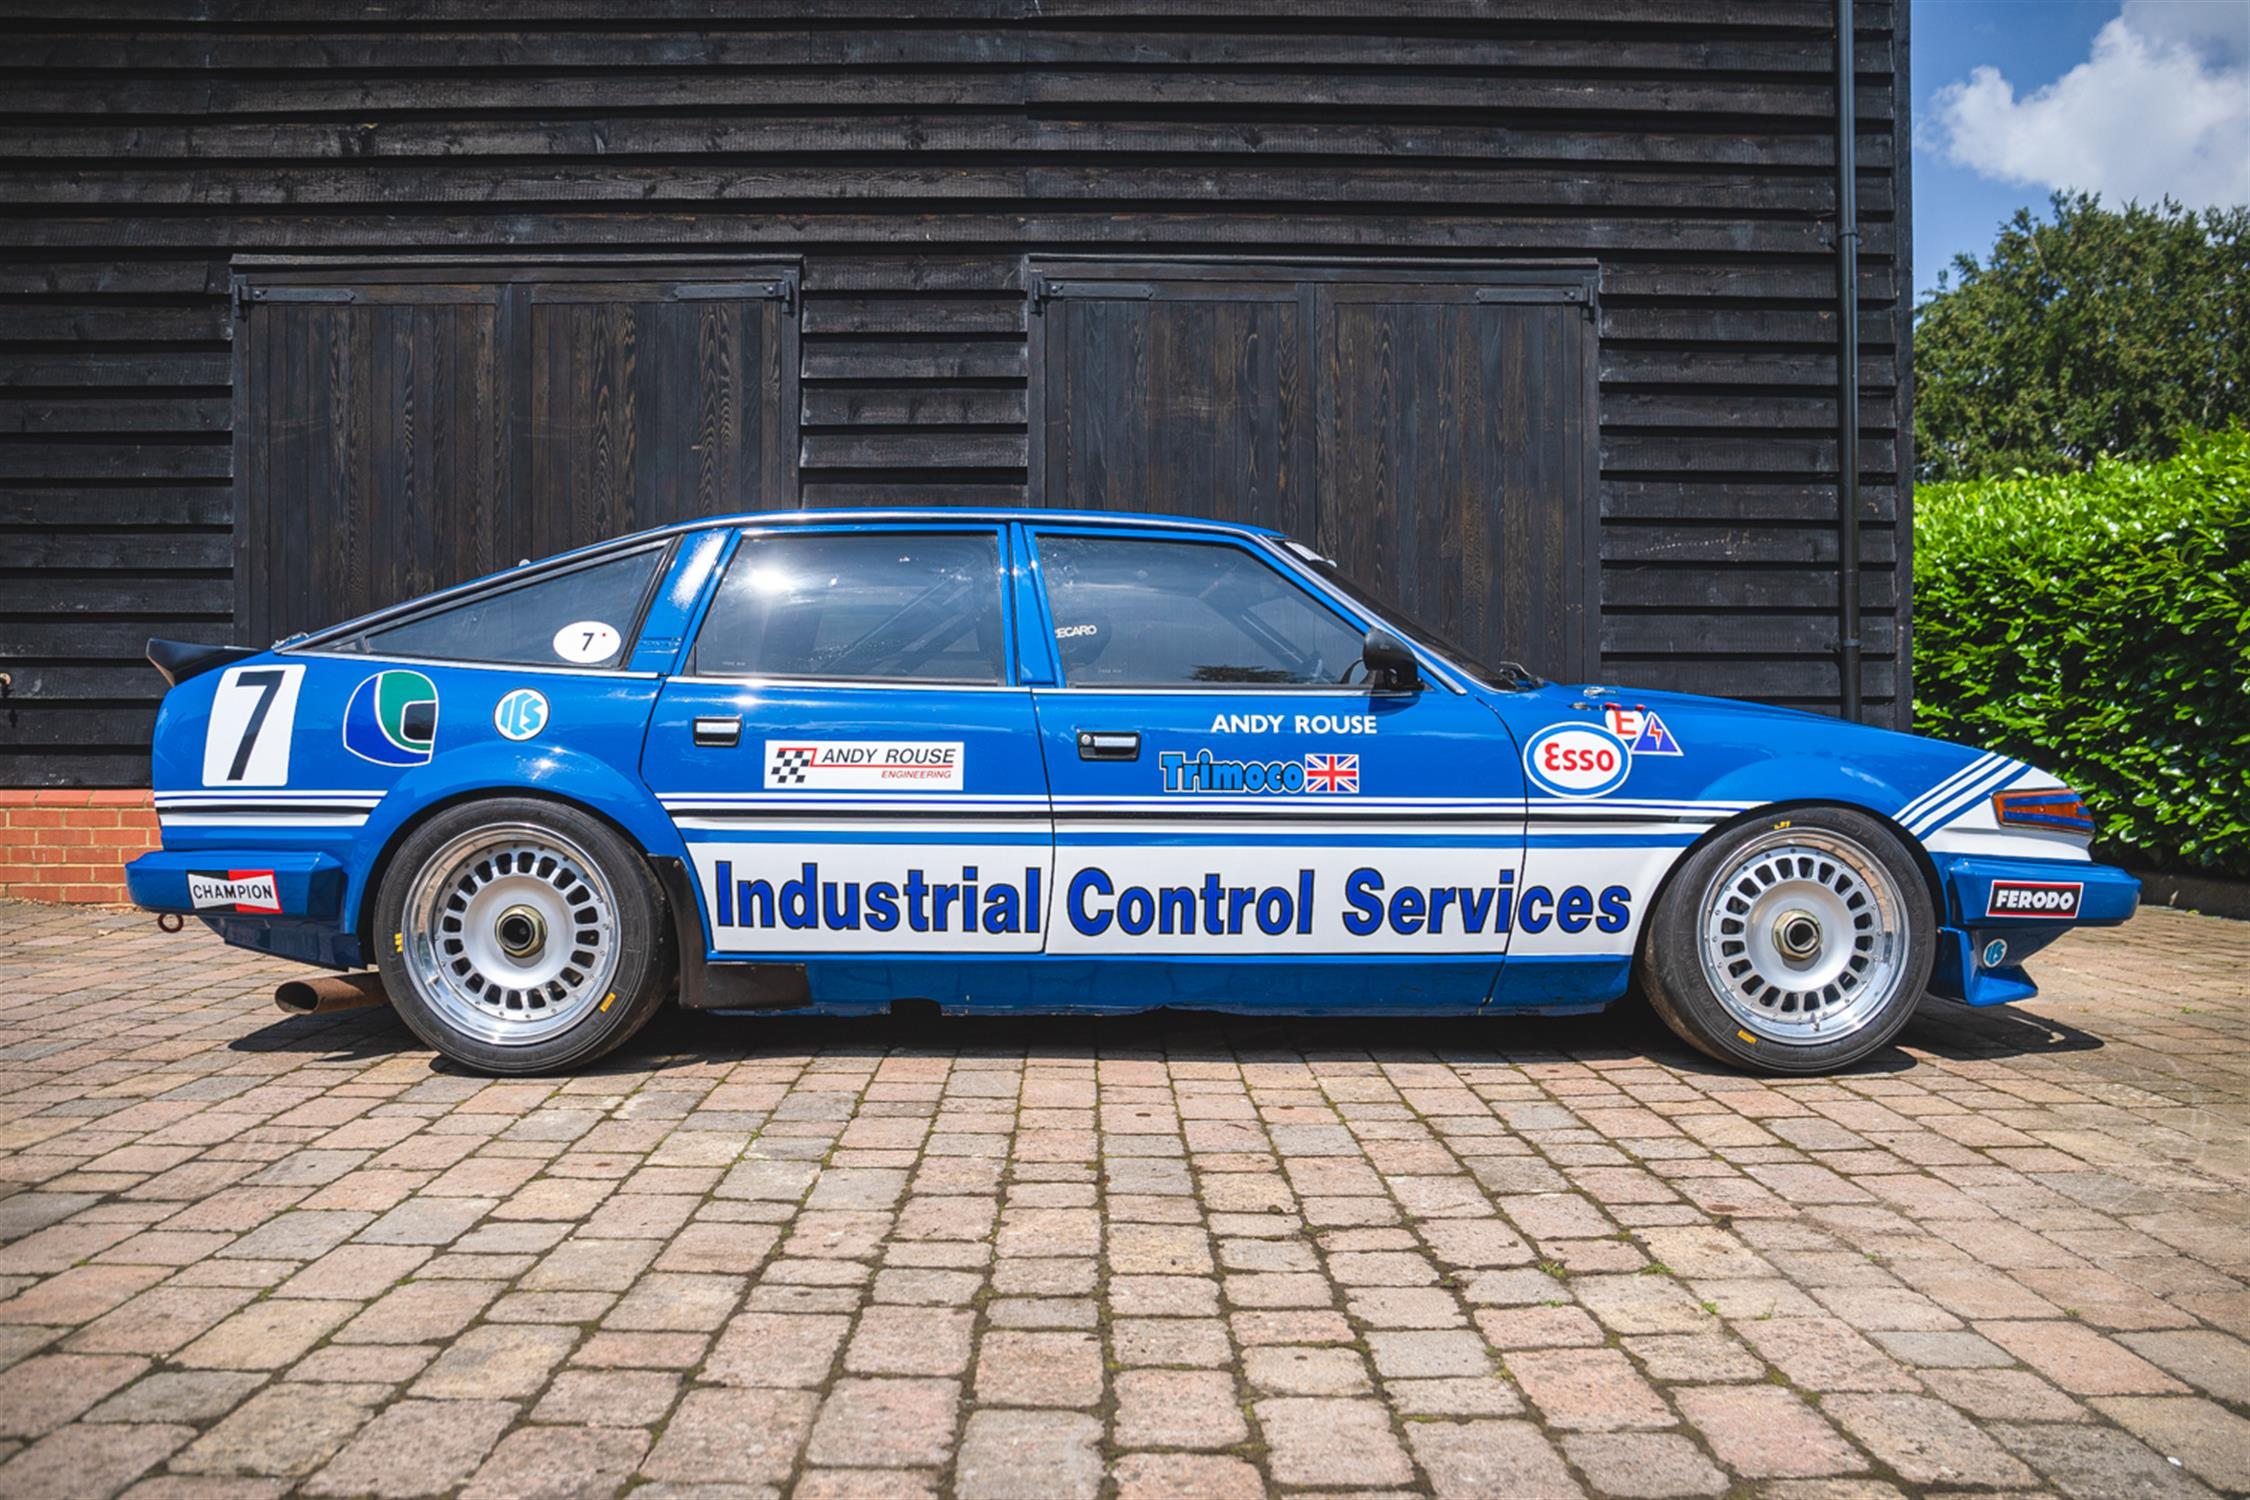 BTCC Championship-Winning 'Group A' ICS Rover Vitesse - Ex-Andy Rouse - Image 9 of 12